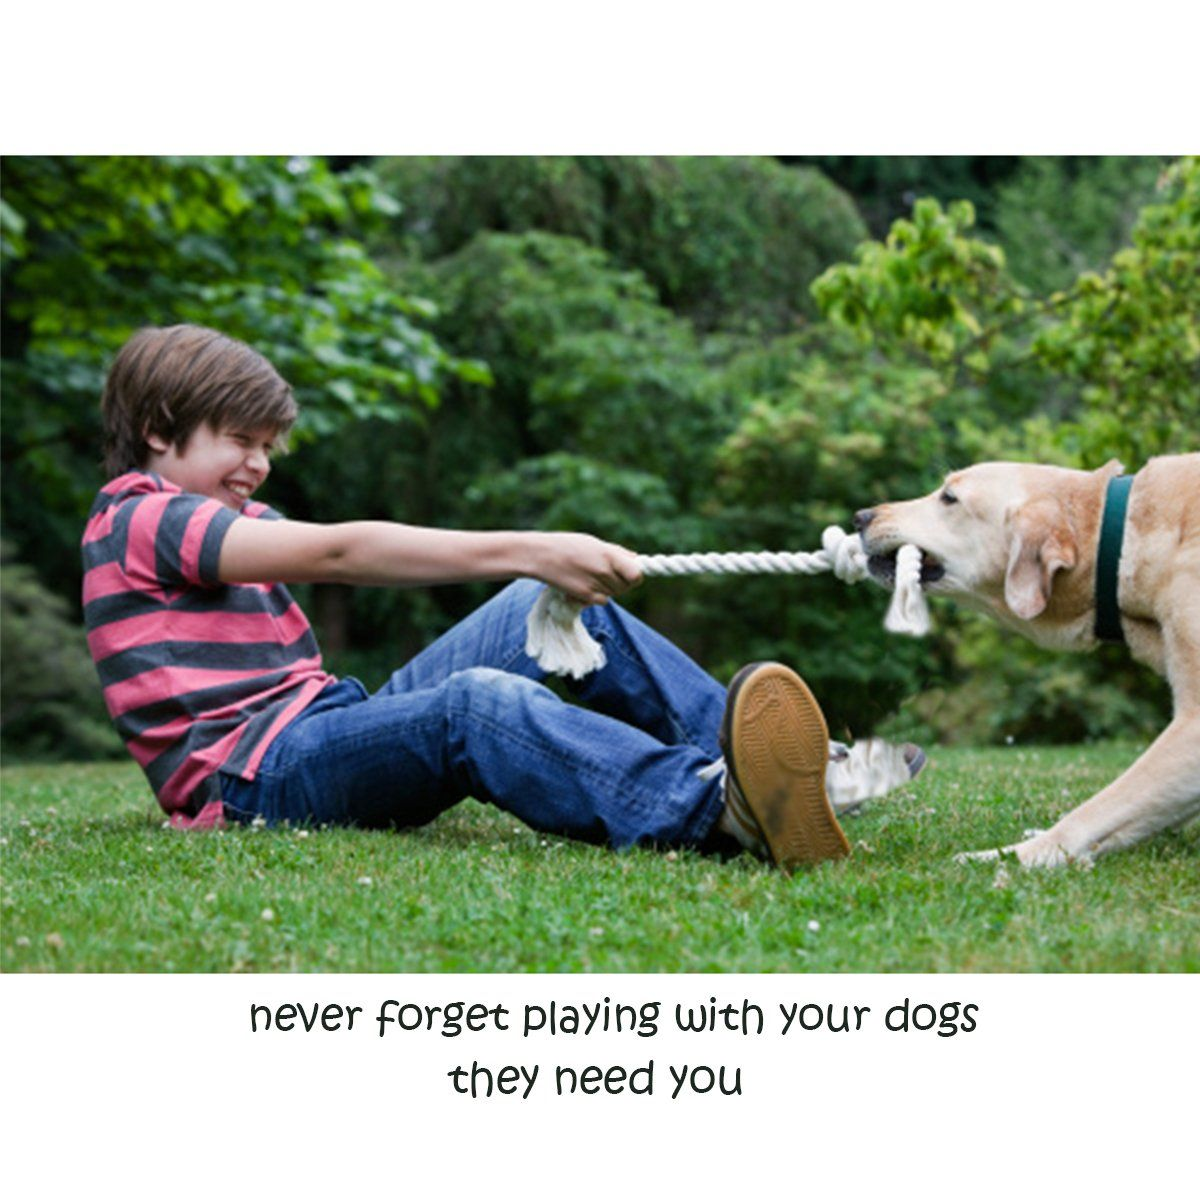 Buibiiu Dog Rope Toys Dog Teething Toys Best Chew Toys For Teething Puppy 12 Pcs Gift Set Toys Teething Rope Bu Rope Dog Toys Rope Dog Dog Teething Toys